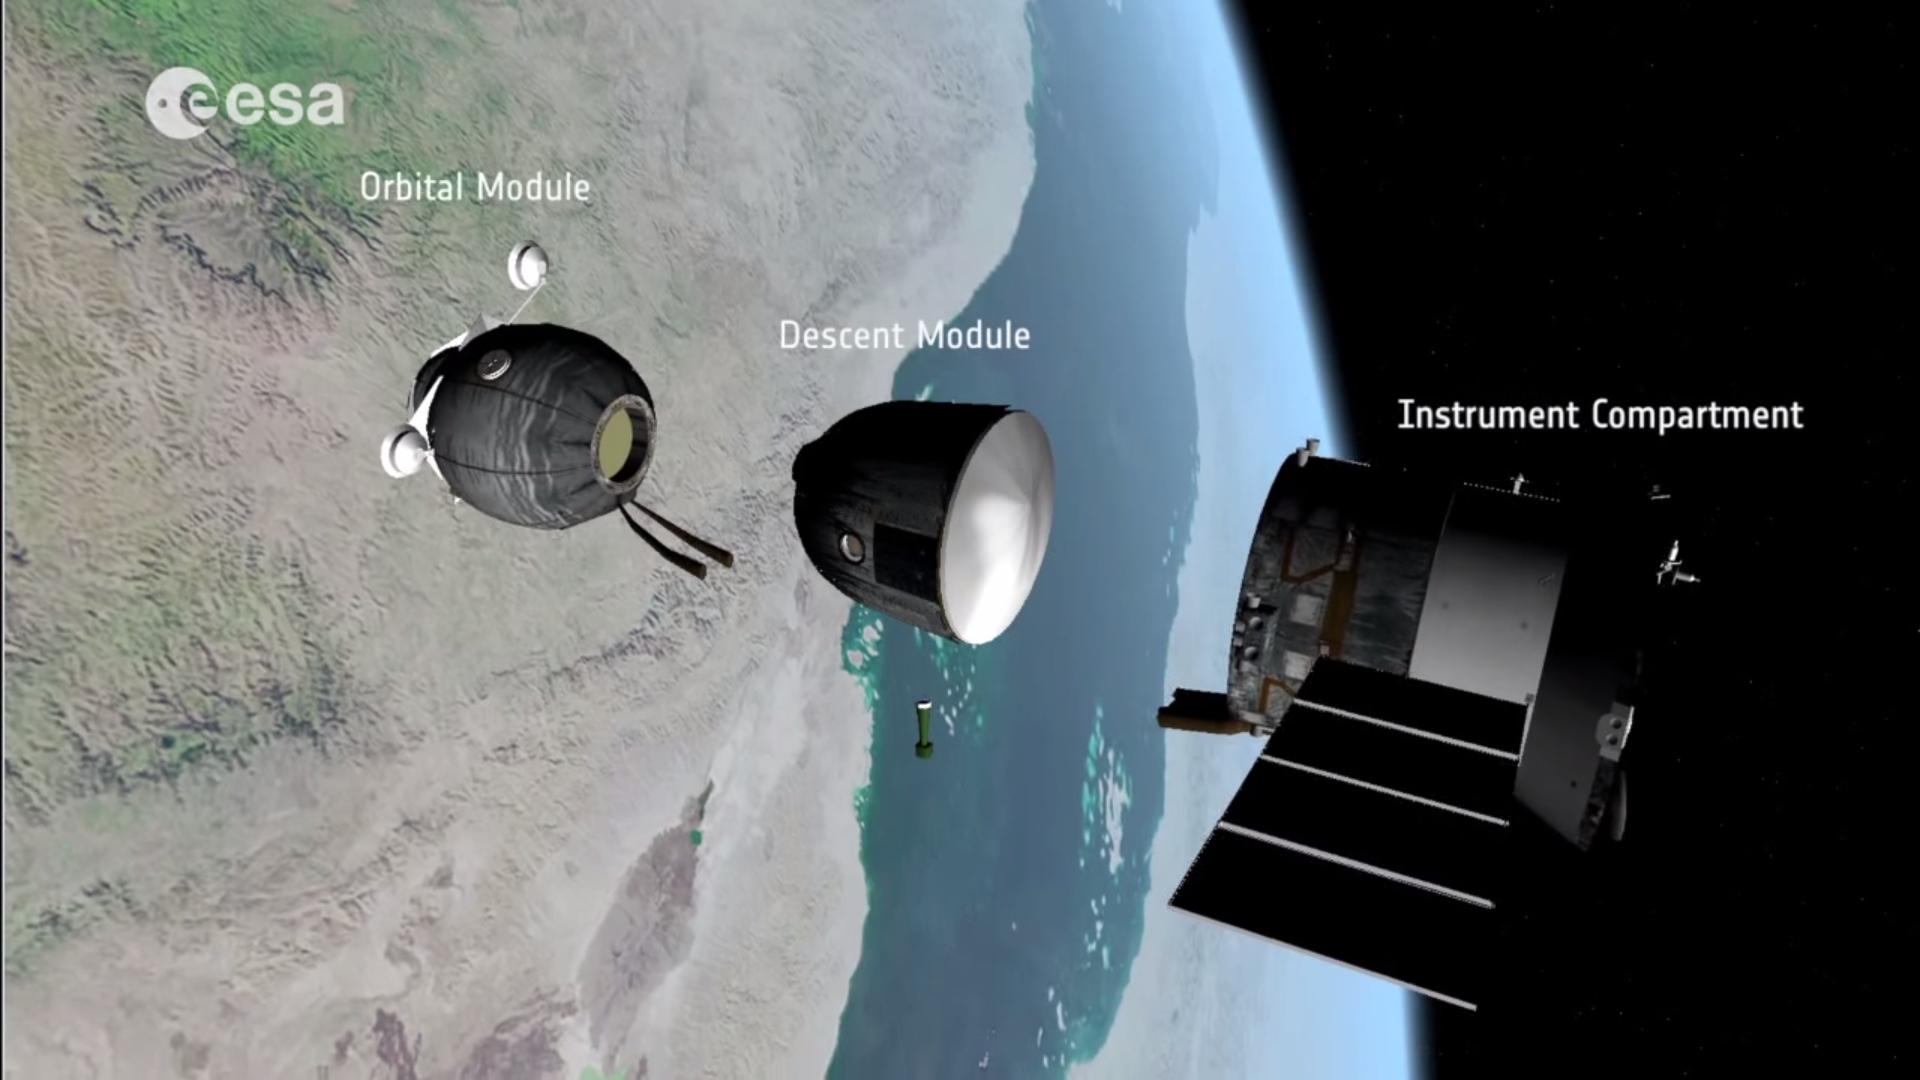 Soyouz module separation